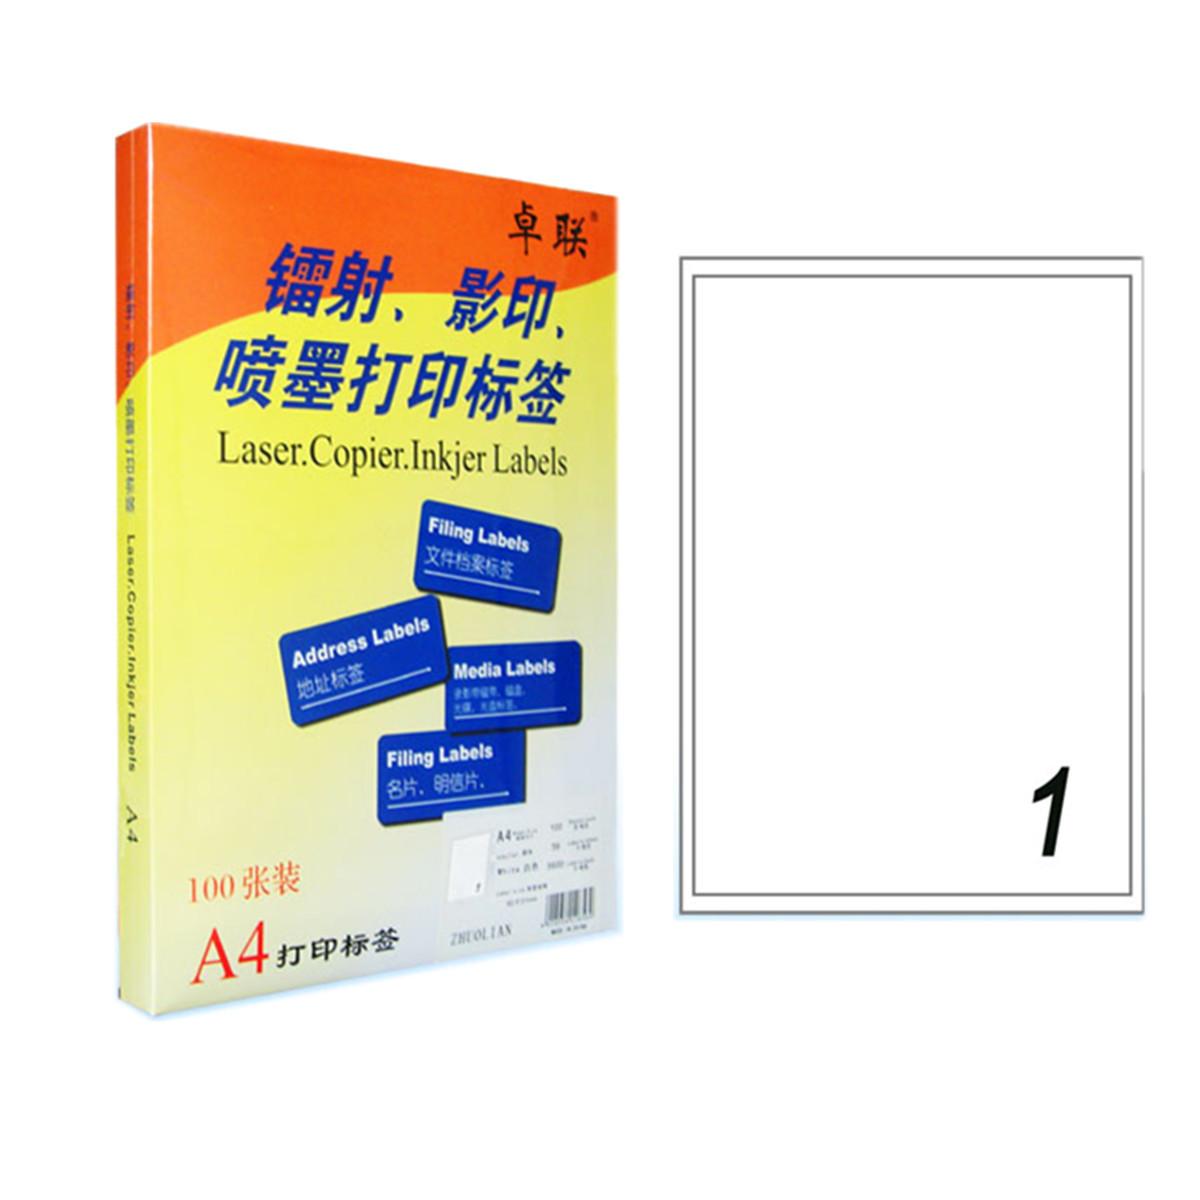 China Laser Shipping Labels, China Laser Shipping Labels Shopping